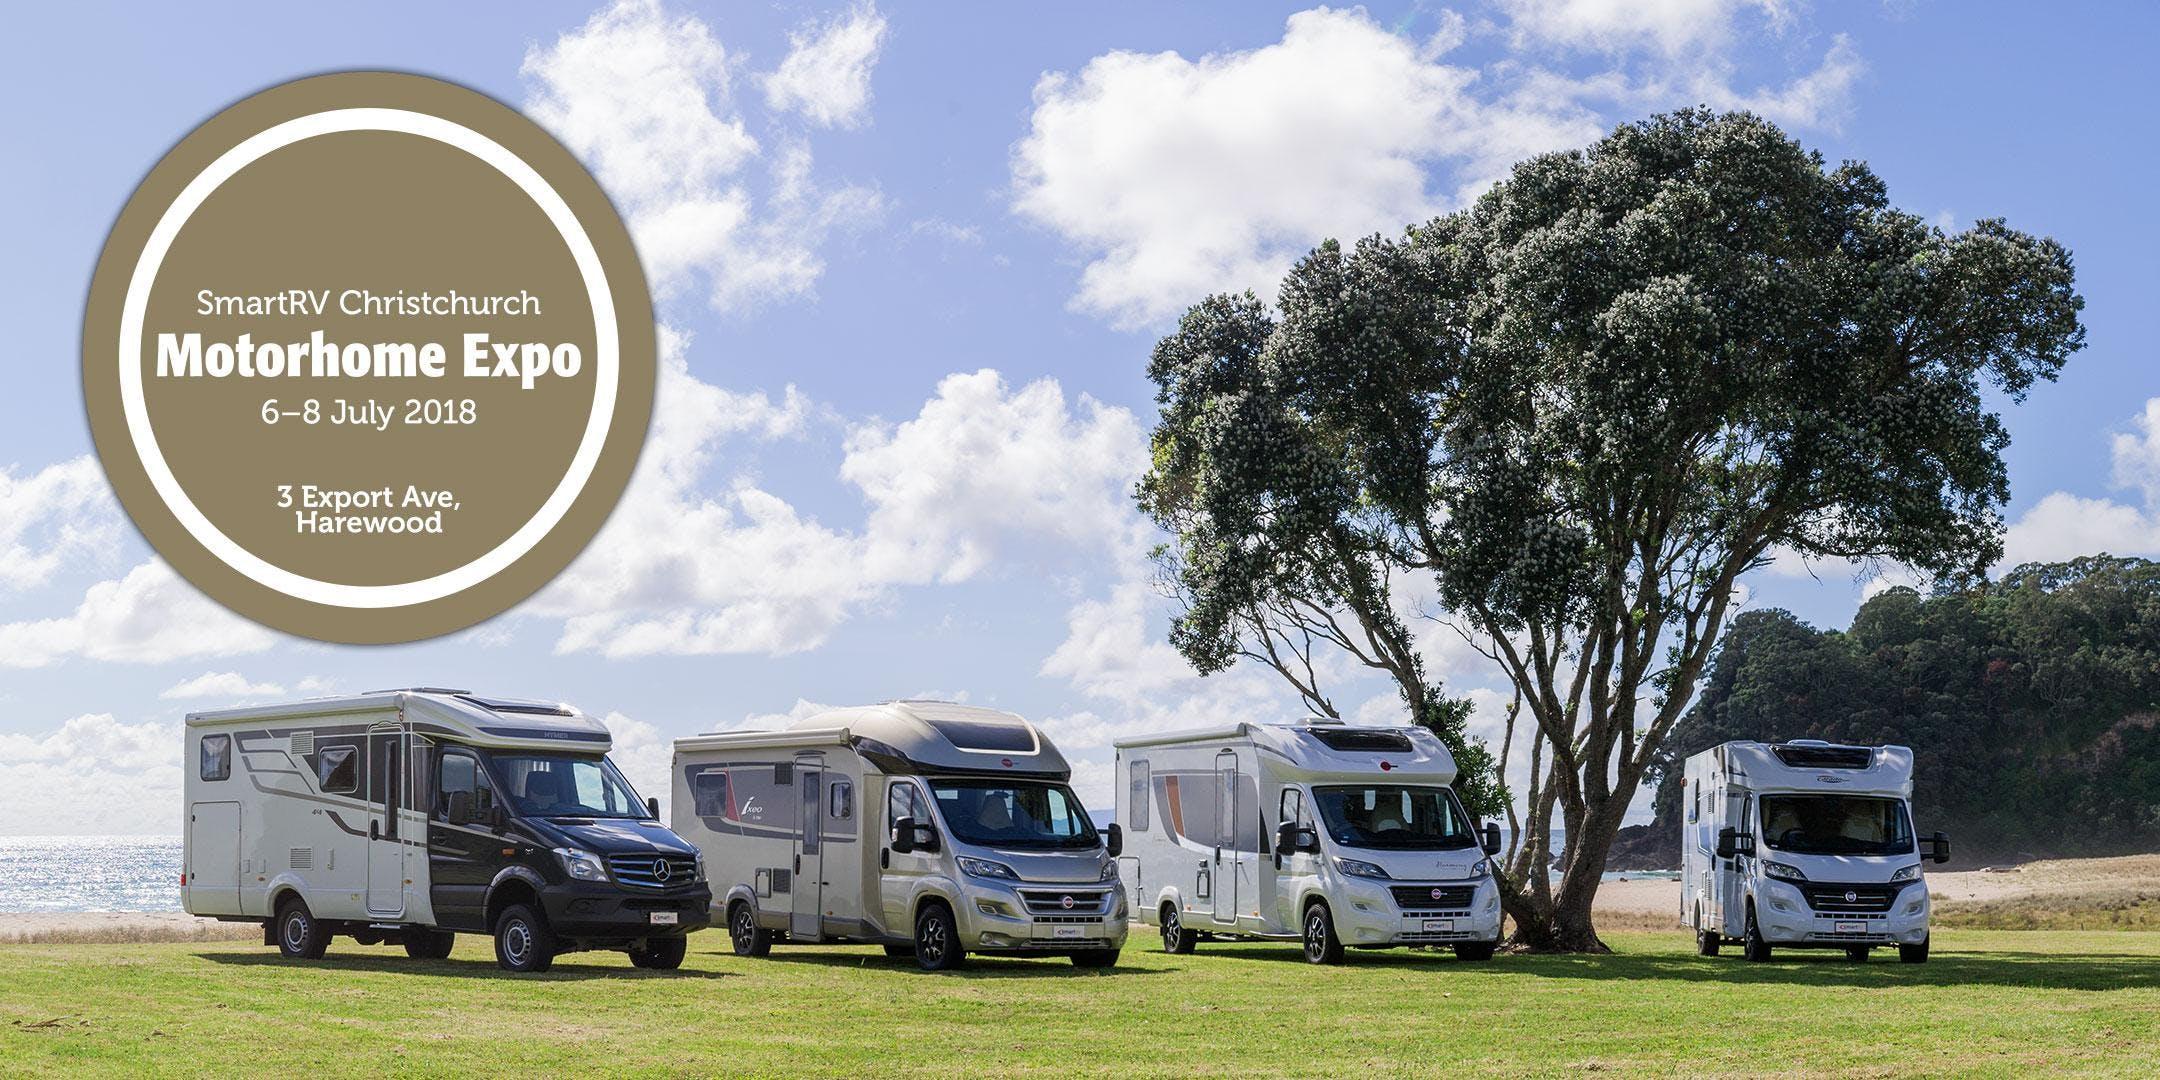 SmartRV Christchurch Motorhome Expo